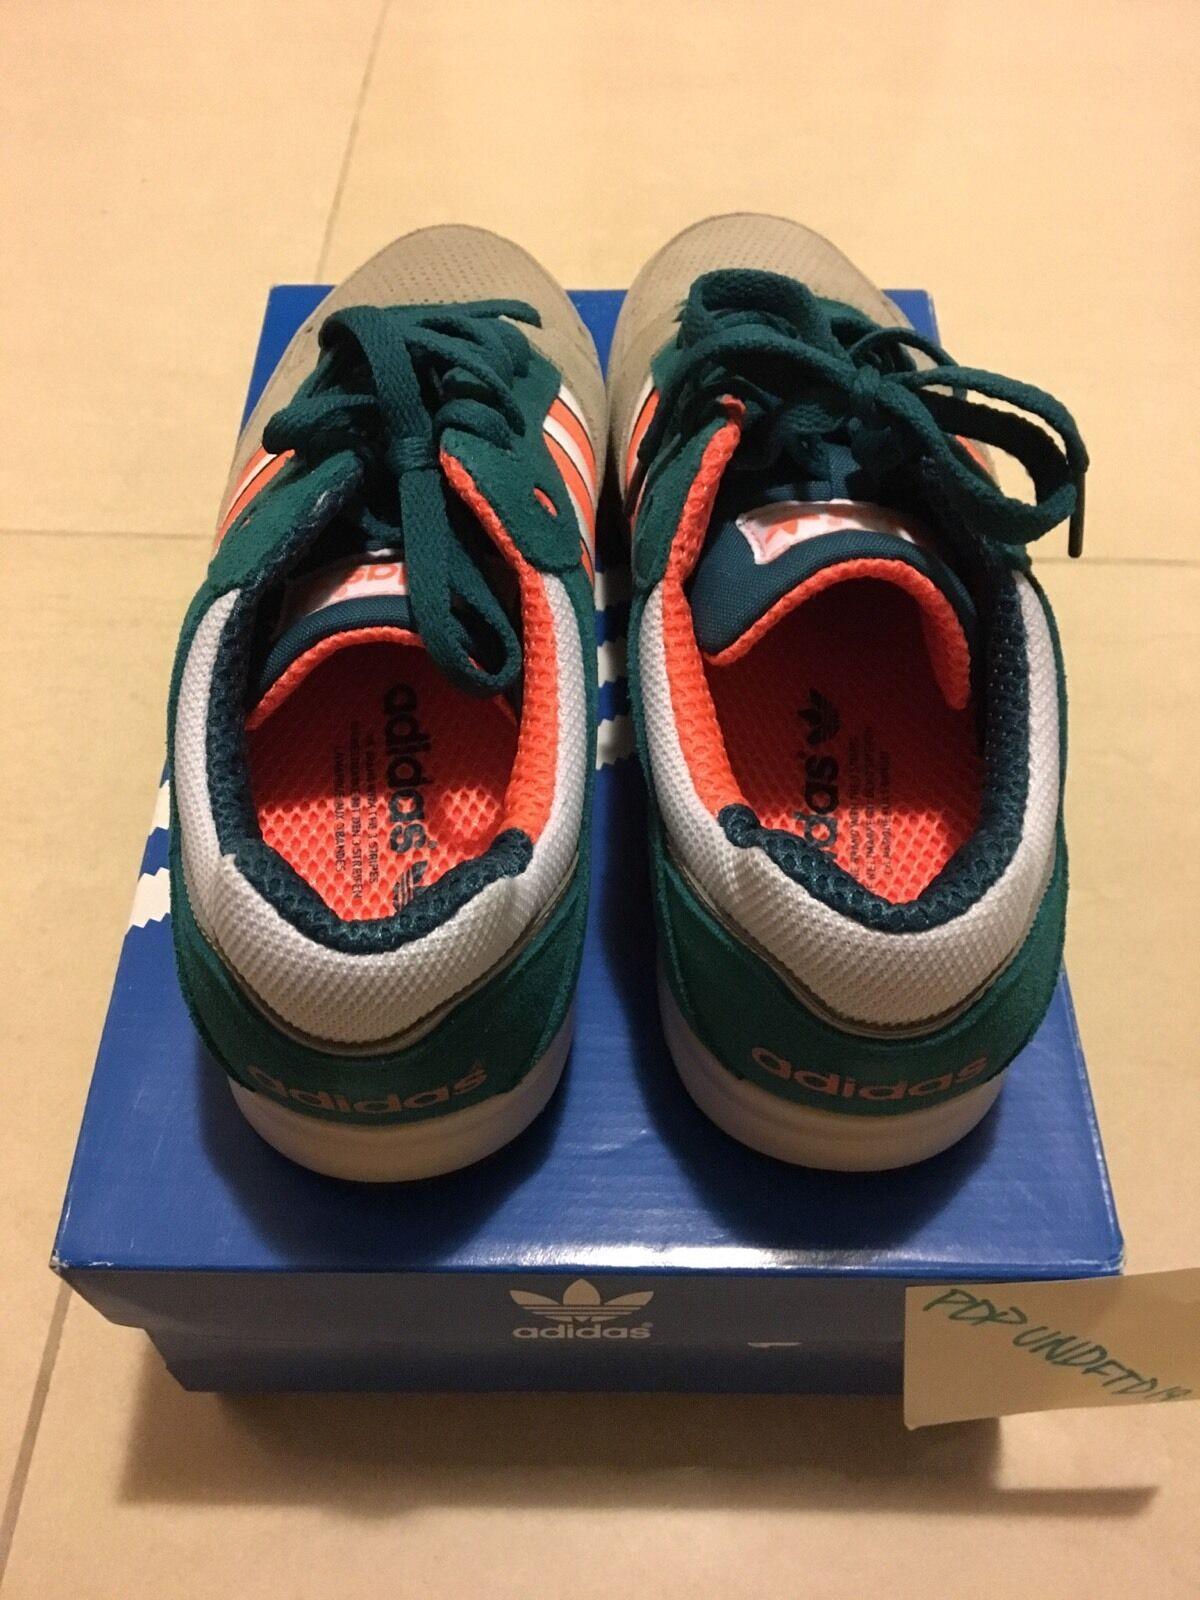 Ds adidas - dolphin super - miami dolphin - größe 9,5 189d3b